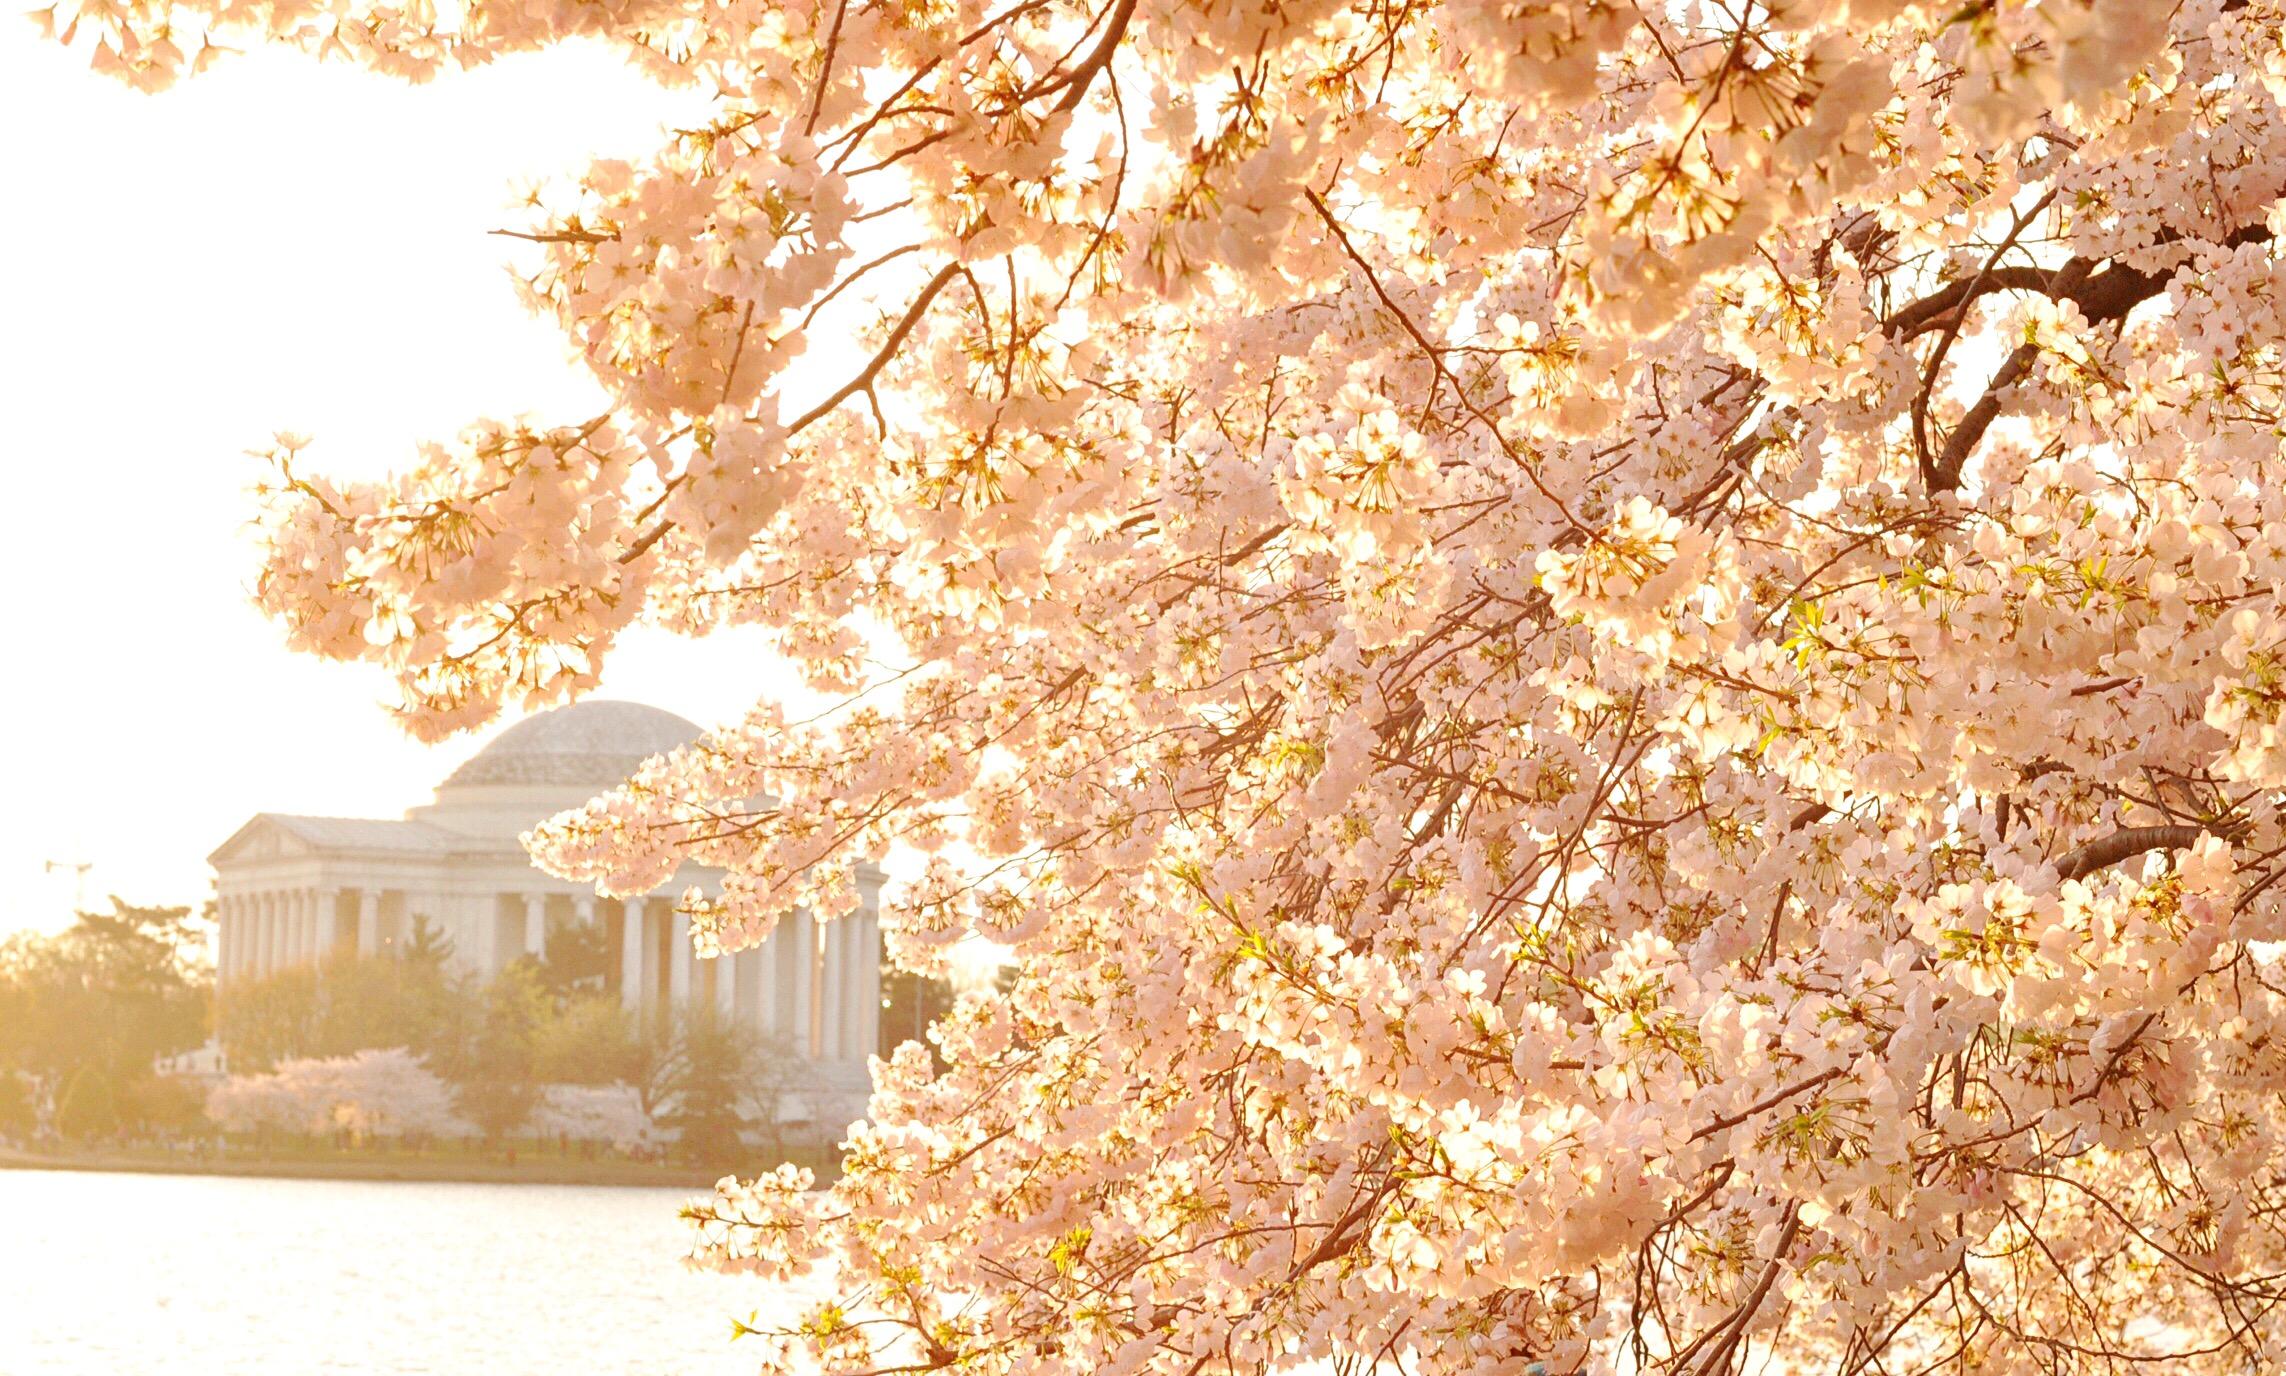 The sun dawning on the Jefferson Memorial in Washington, D.C.